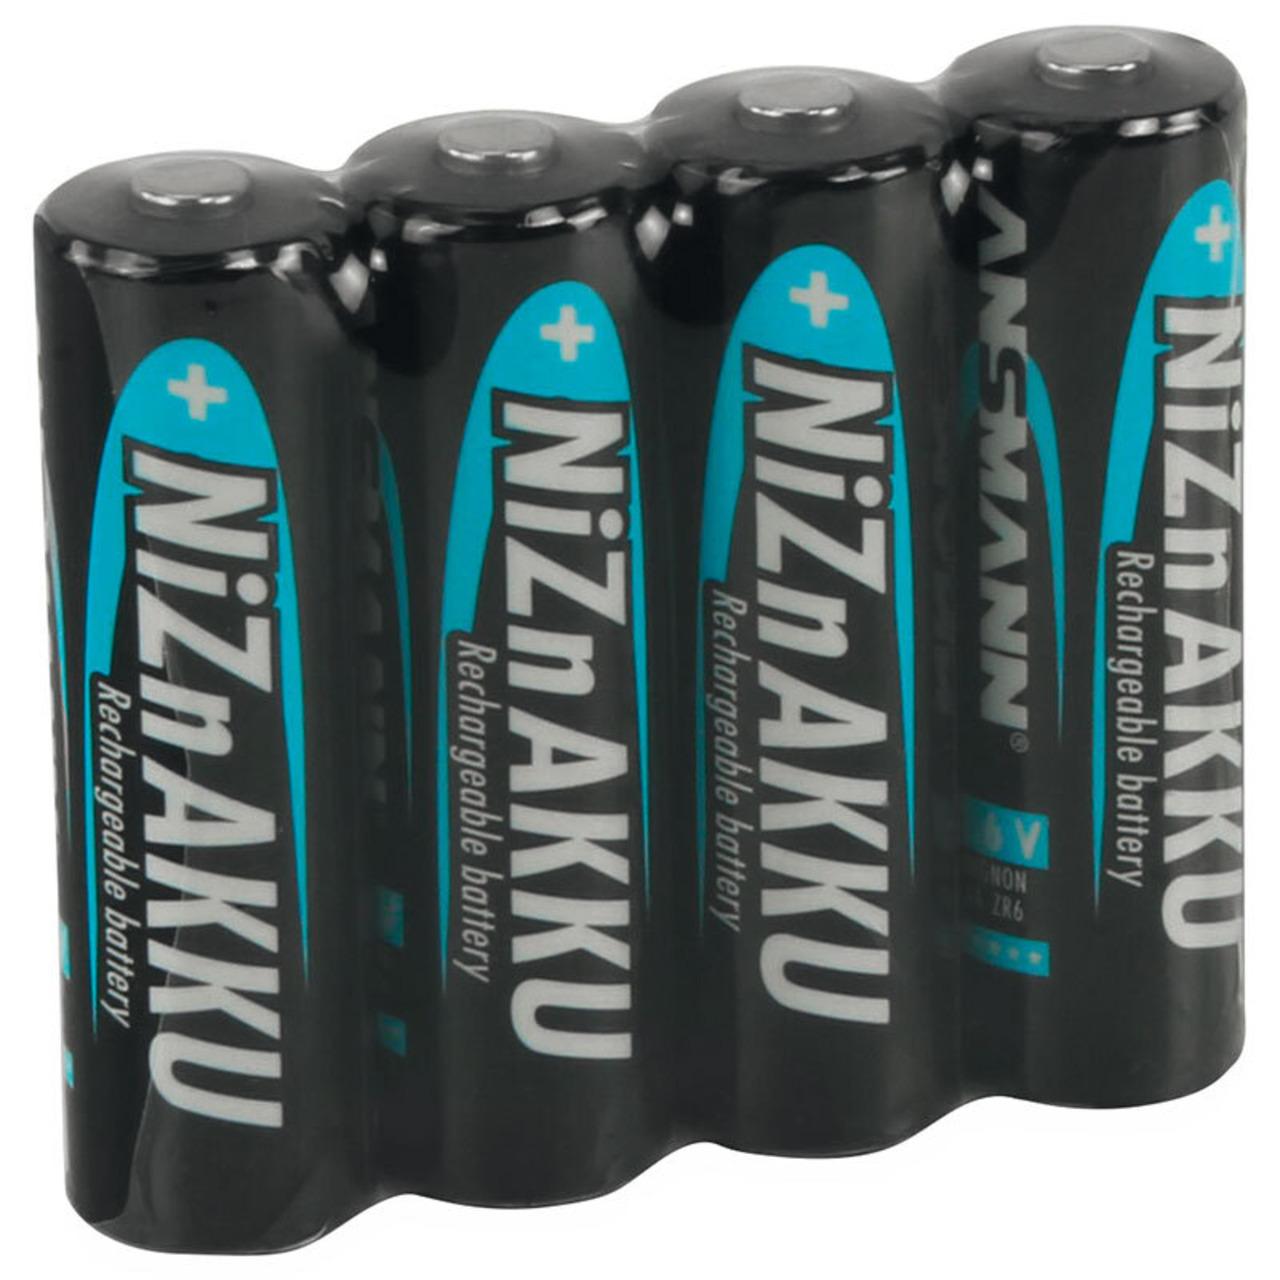 Ansmann NiZn-Akku Mignon 1-6 V 1500 mAh- 4er-Pack